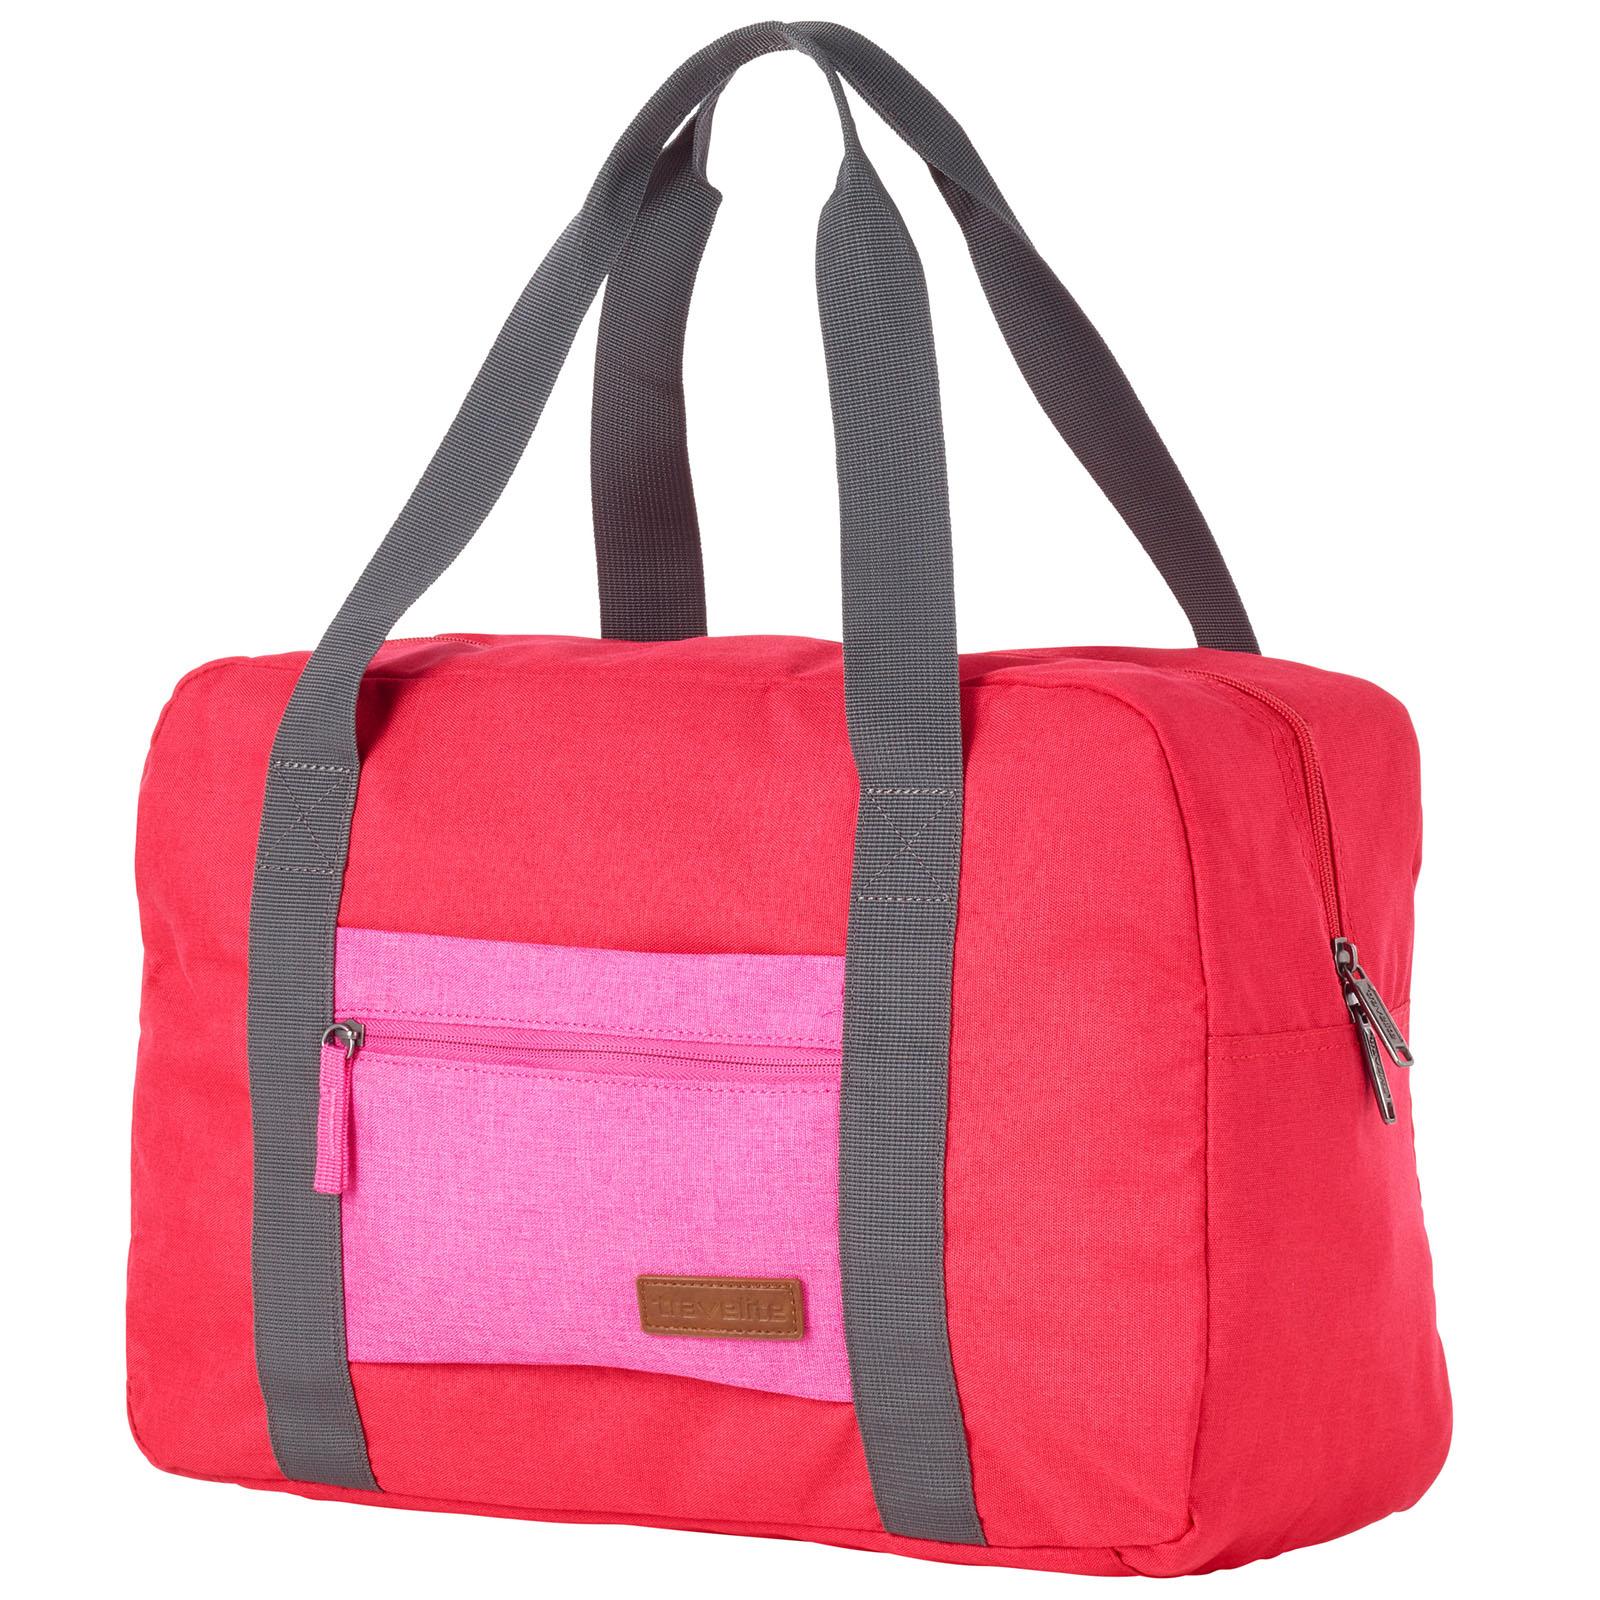 travelite neopak reisetasche rot pink koffer trolley. Black Bedroom Furniture Sets. Home Design Ideas